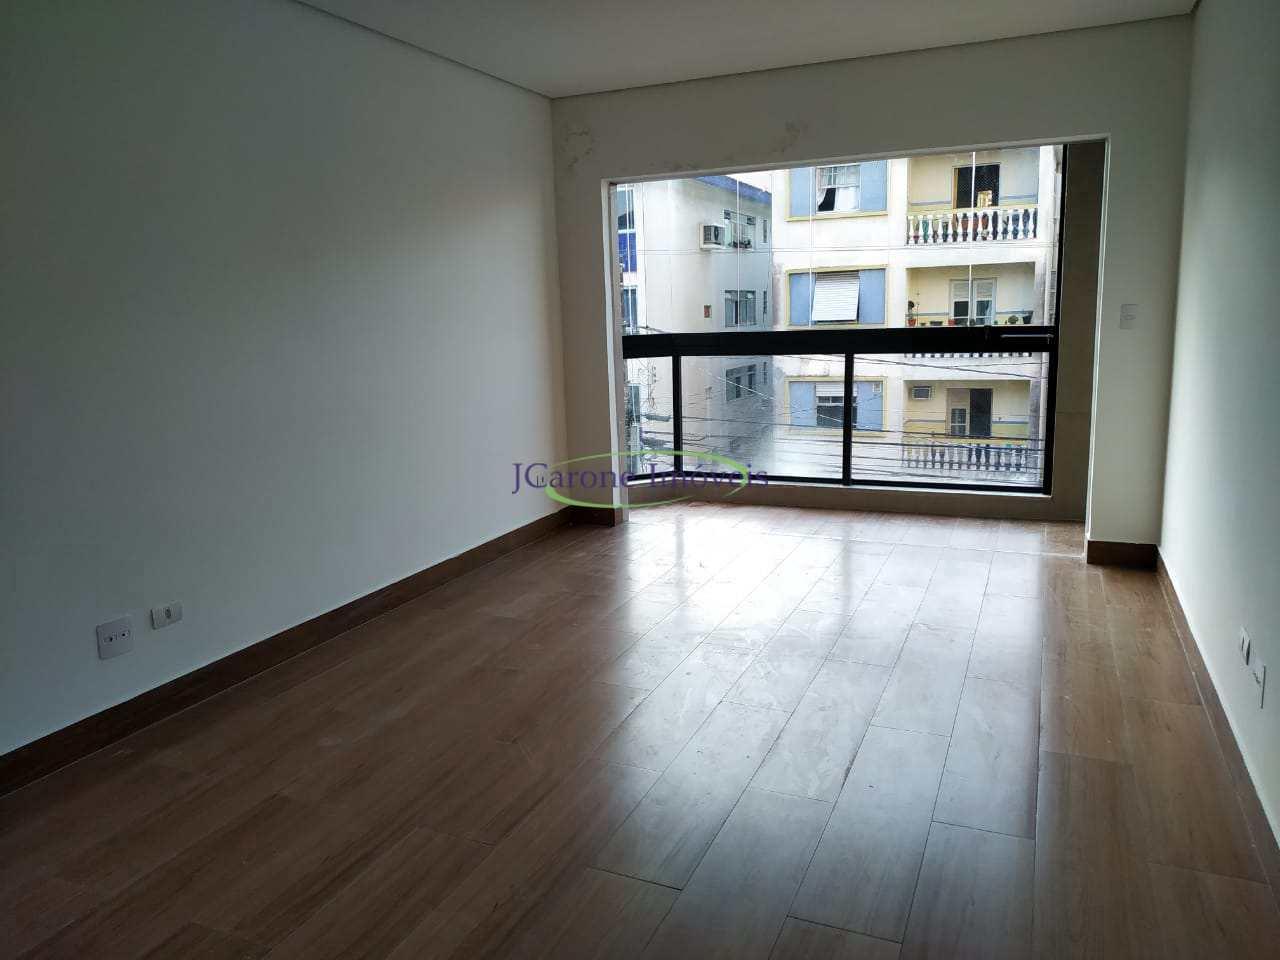 Casa com 4 dorms, Embaré, Santos - R$ 1.57 mi, Cod: 64152823